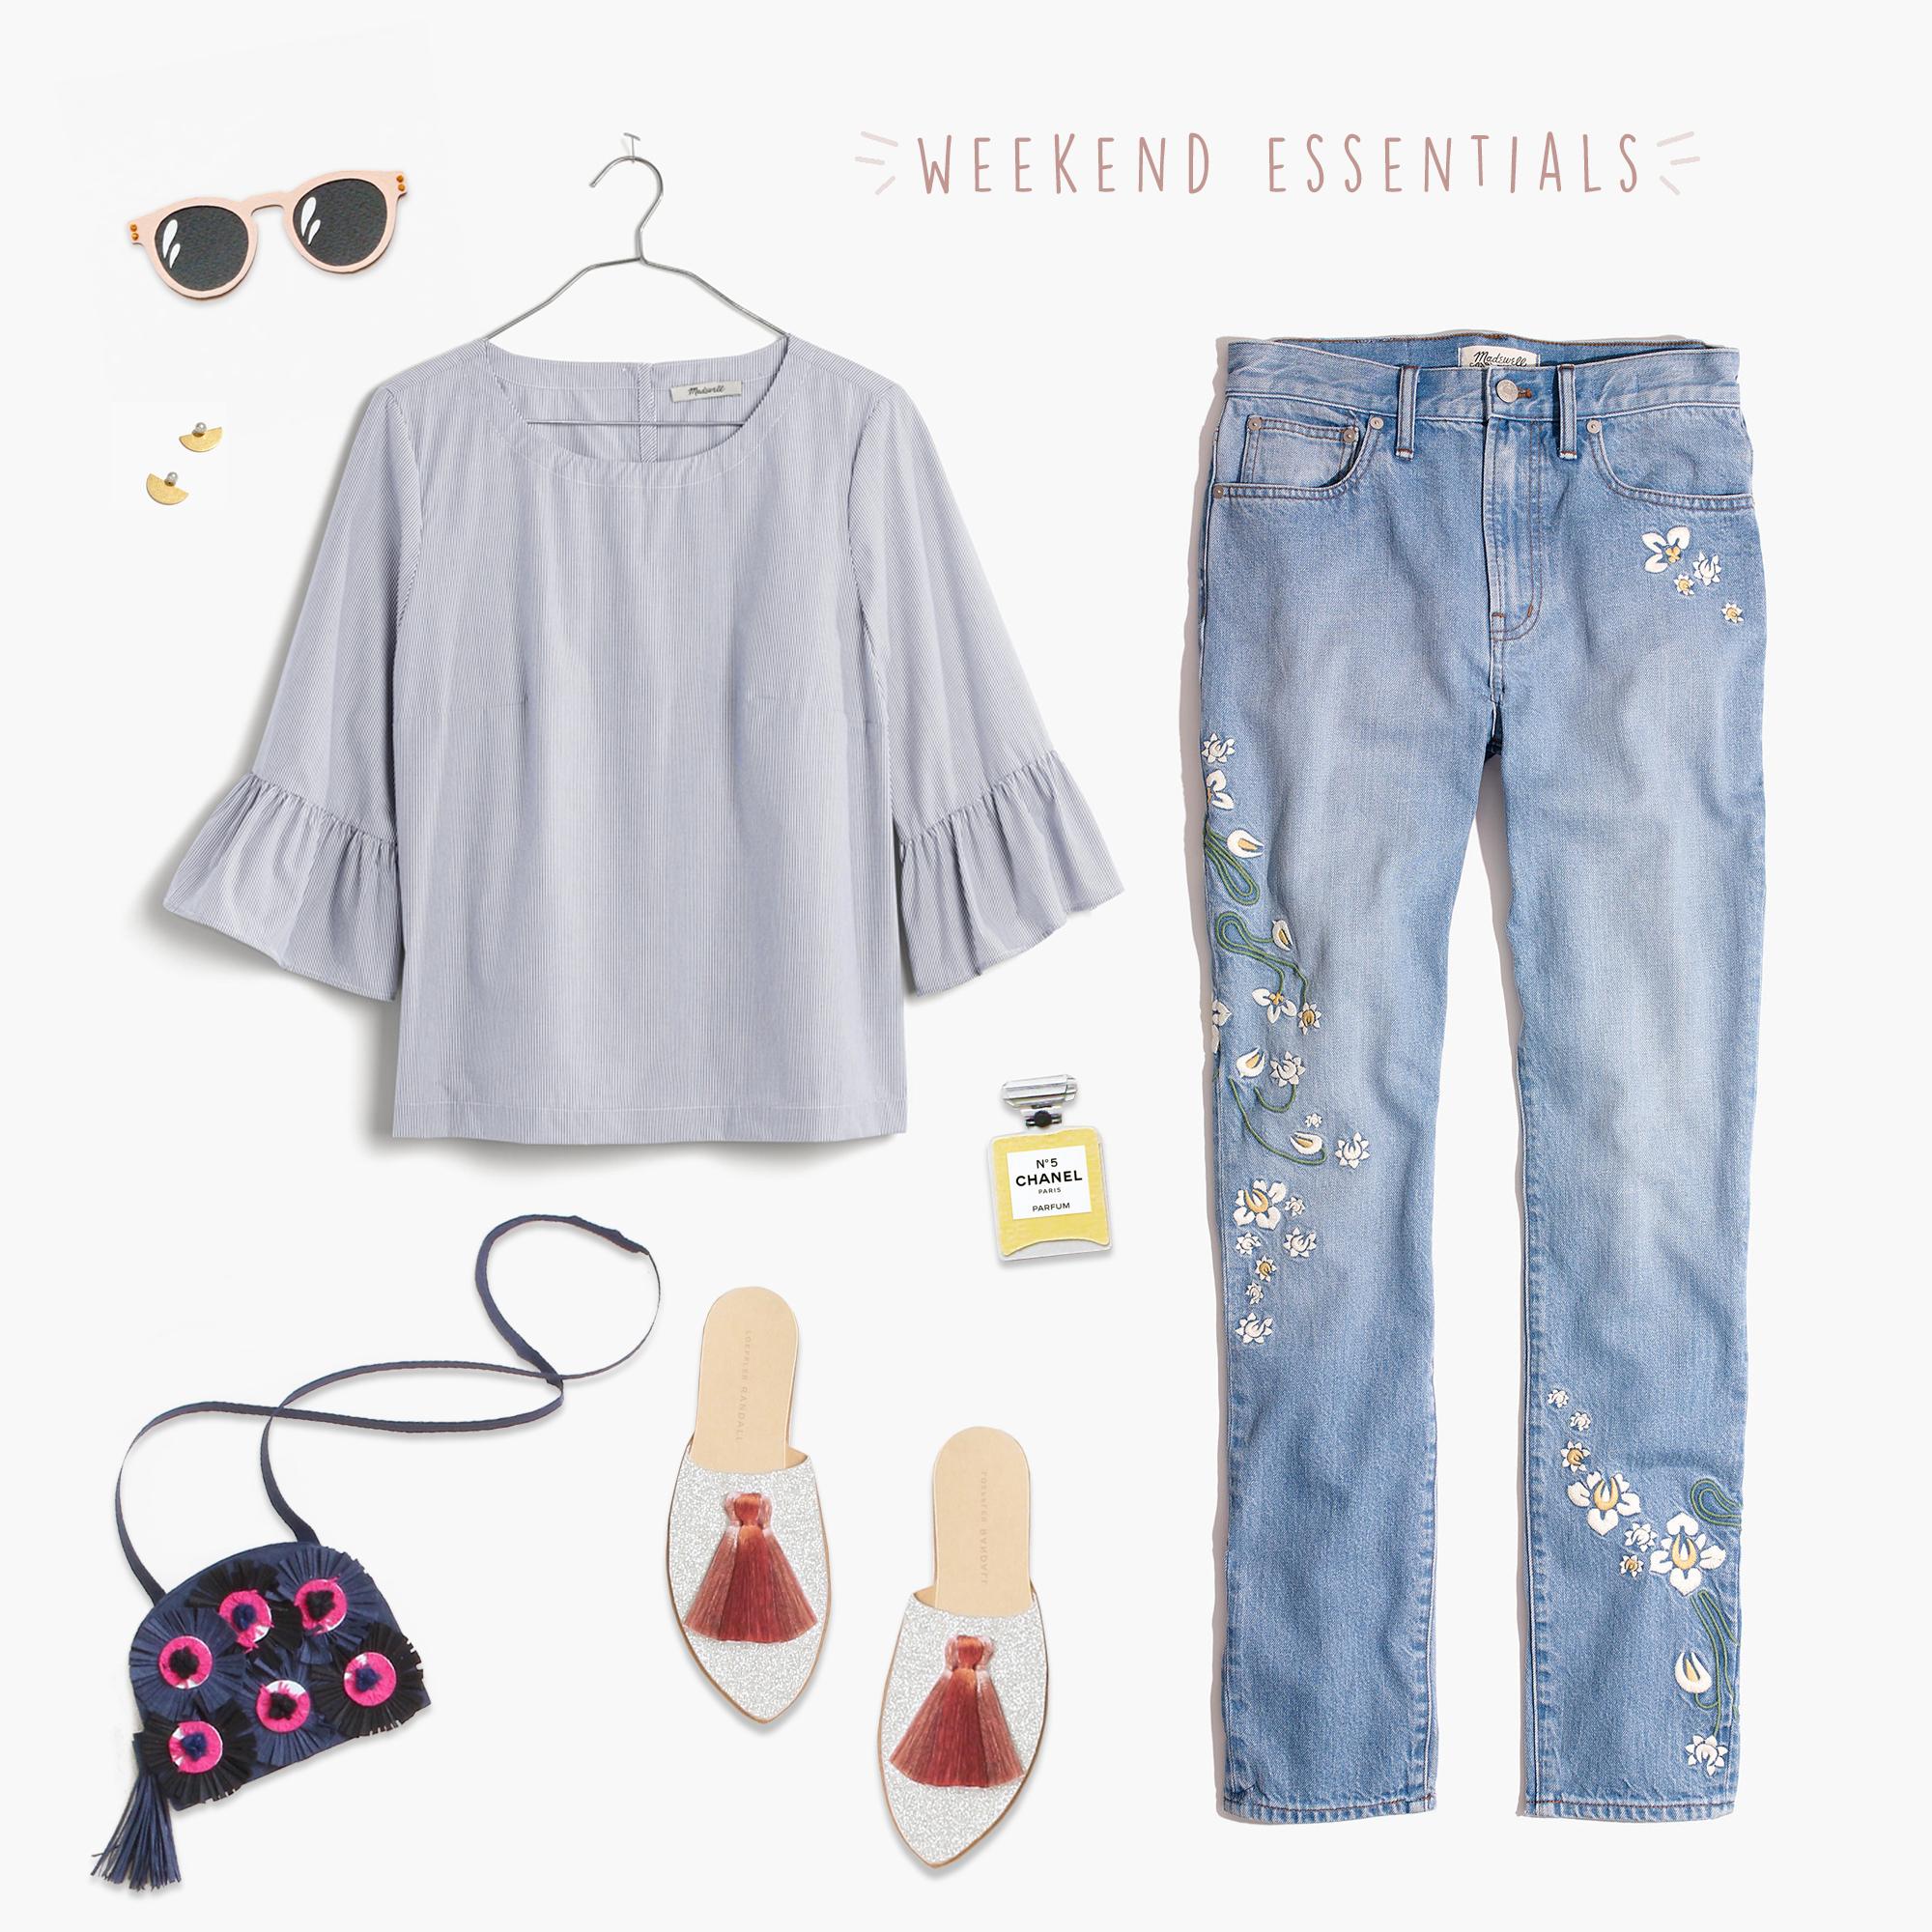 comfortable weekend picks by Brittani Rose